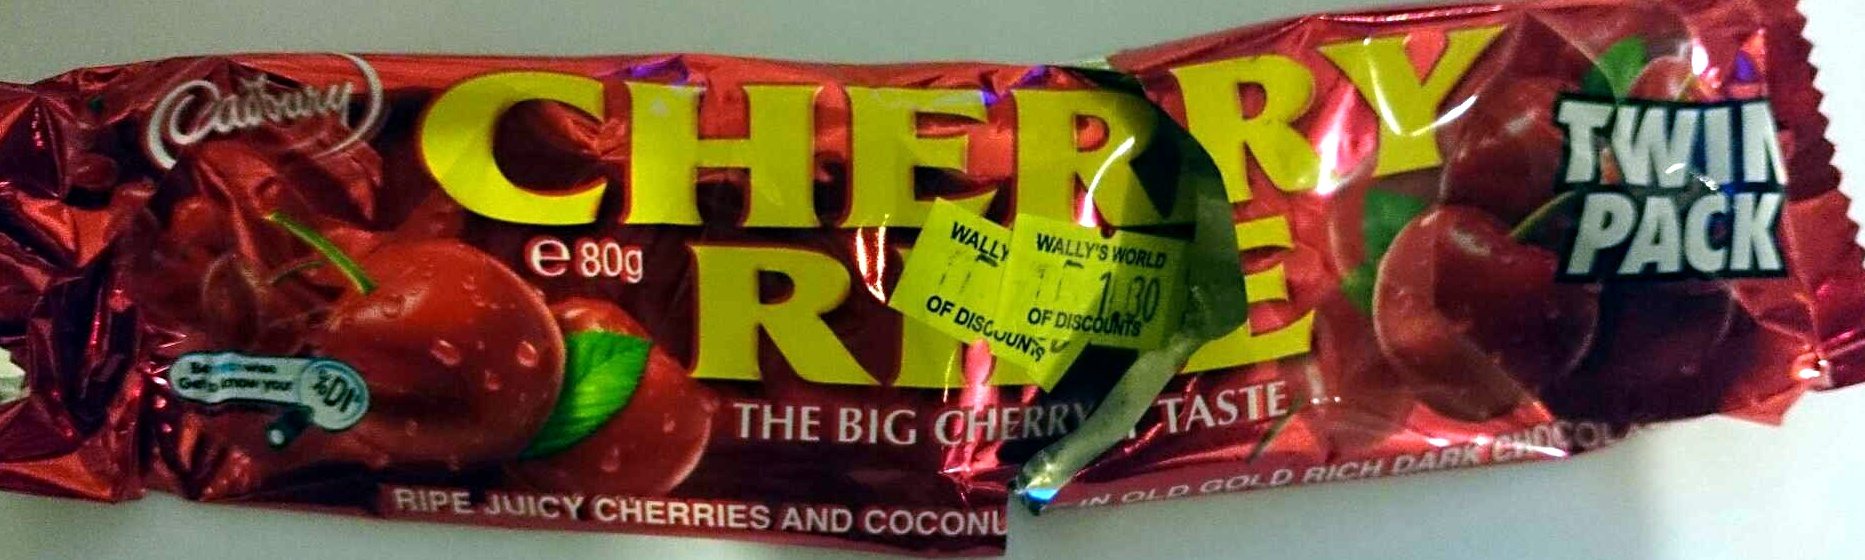 Cherry Ripe Twin Pack - Product - en